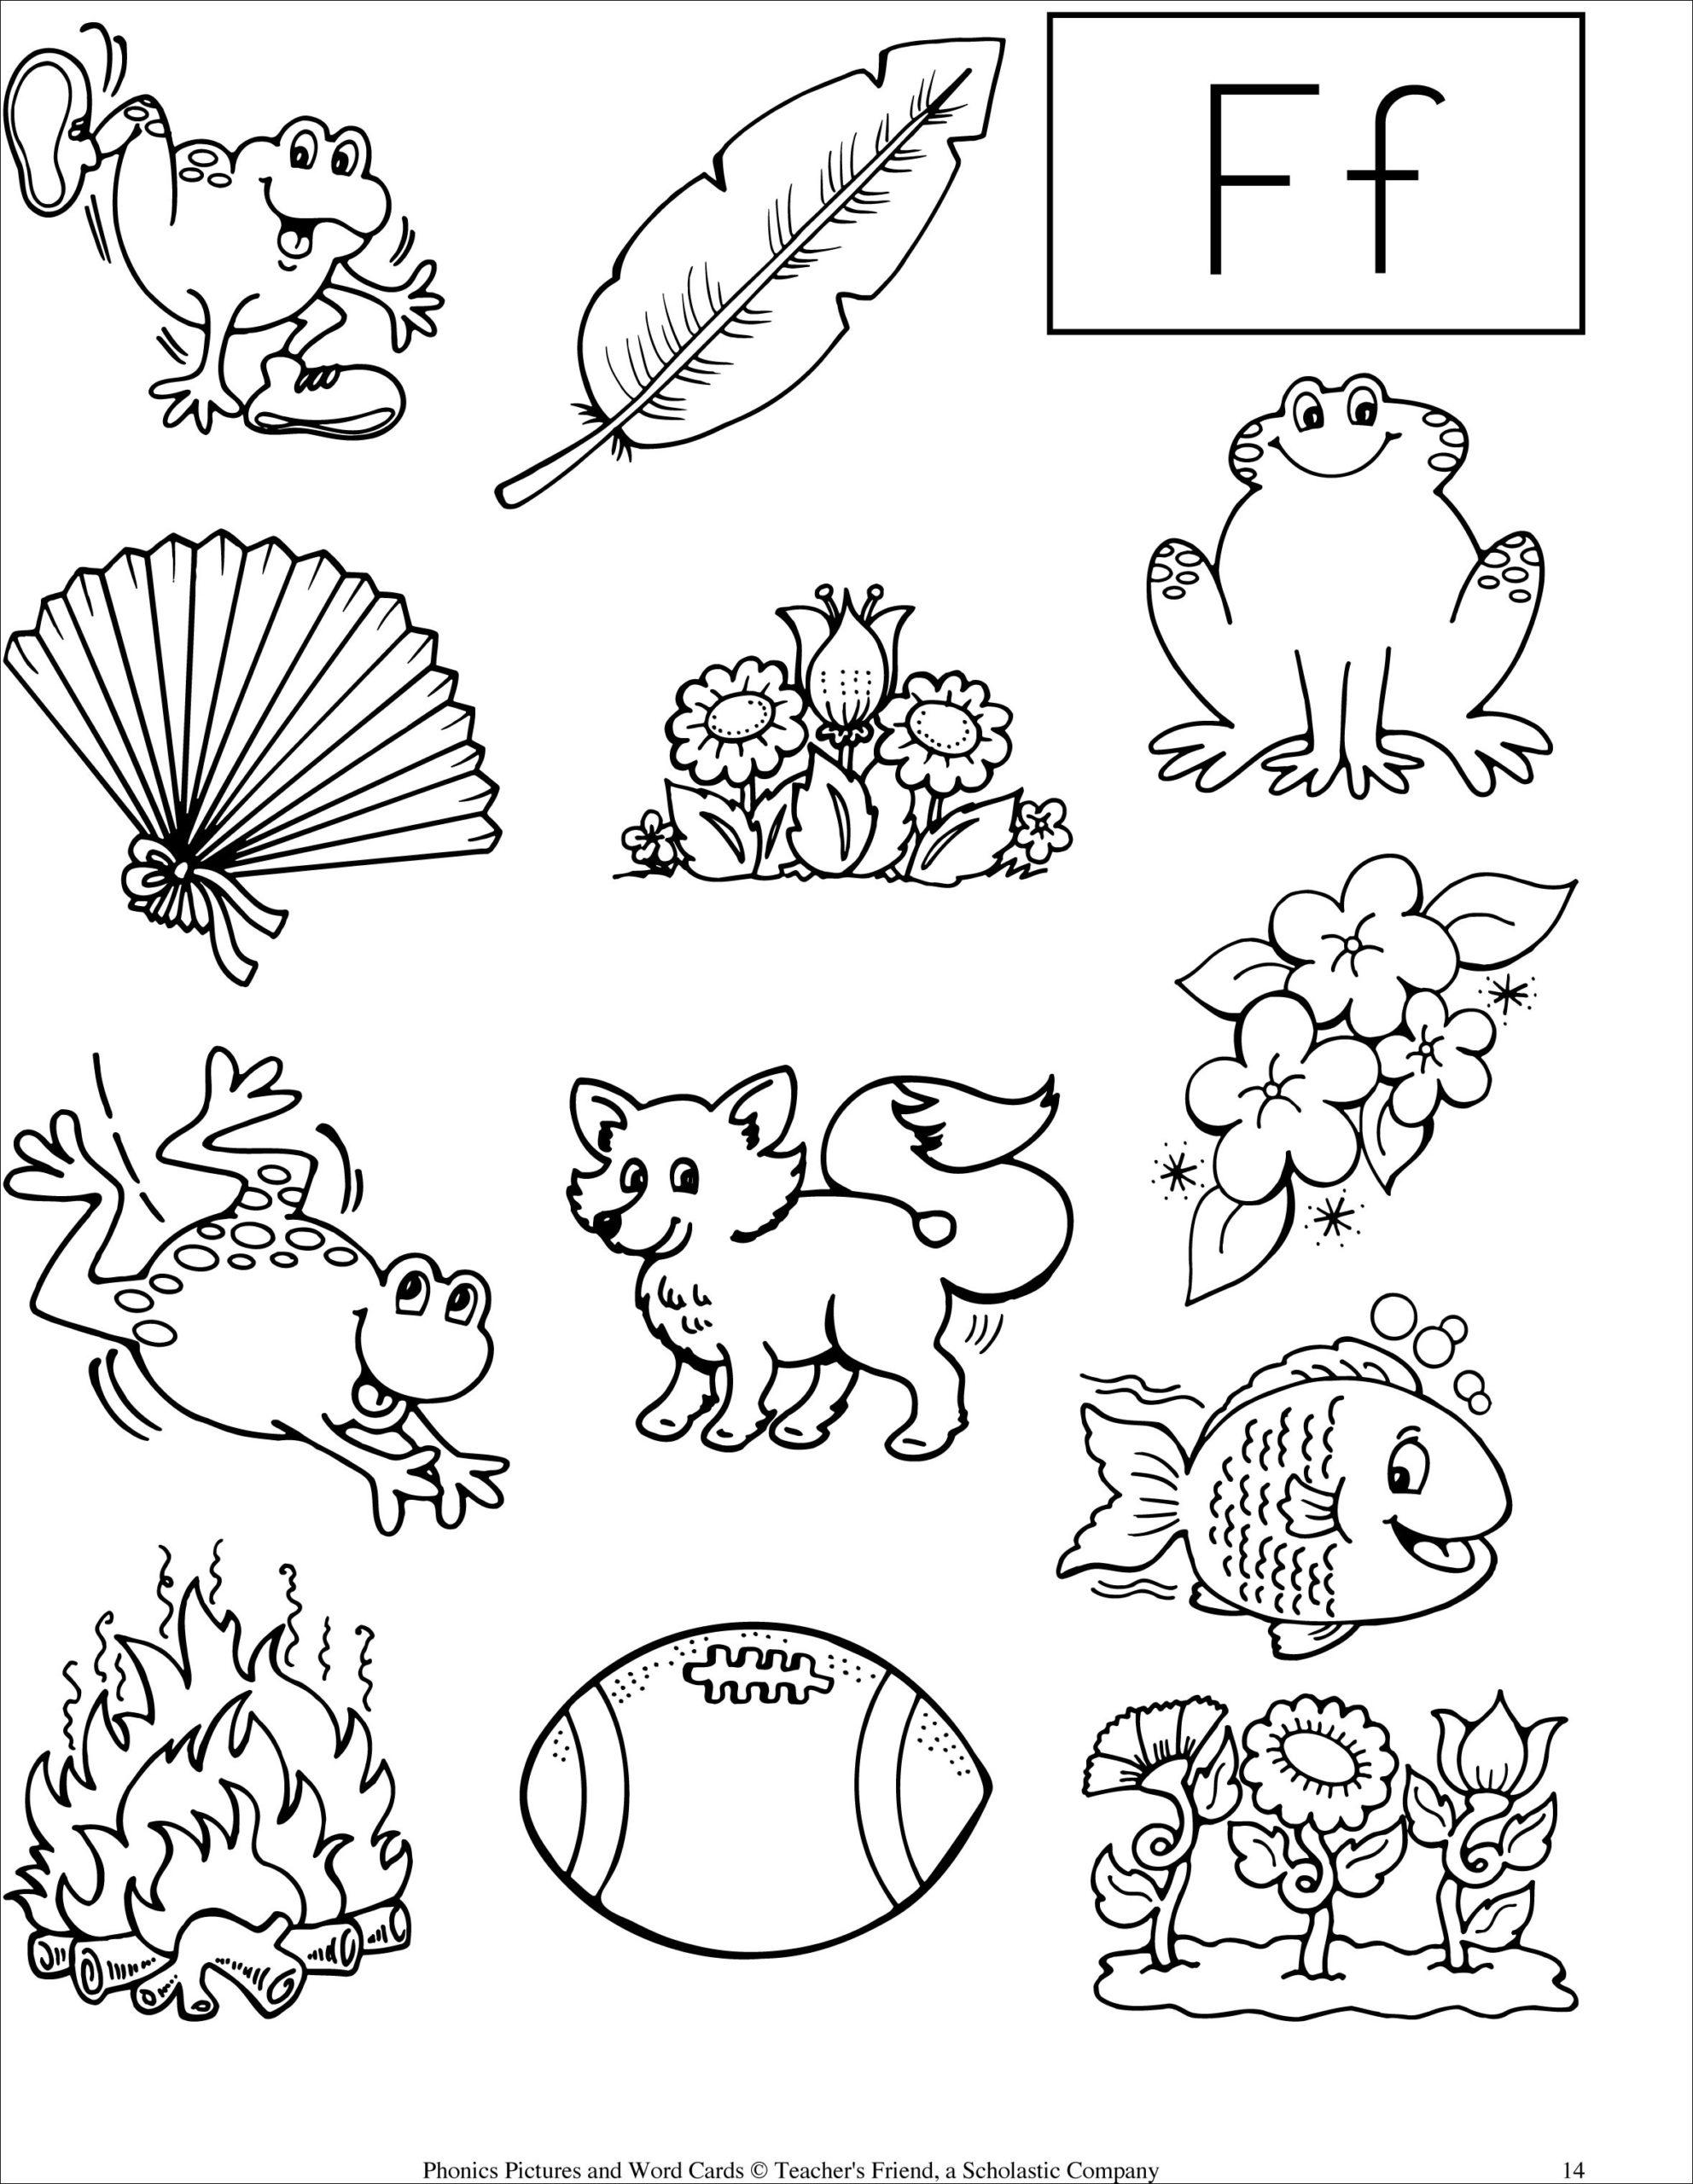 Kidzone Cursive Writing Worksheets Printable And Easy with regard to Name Tracing Worksheets Kidzone